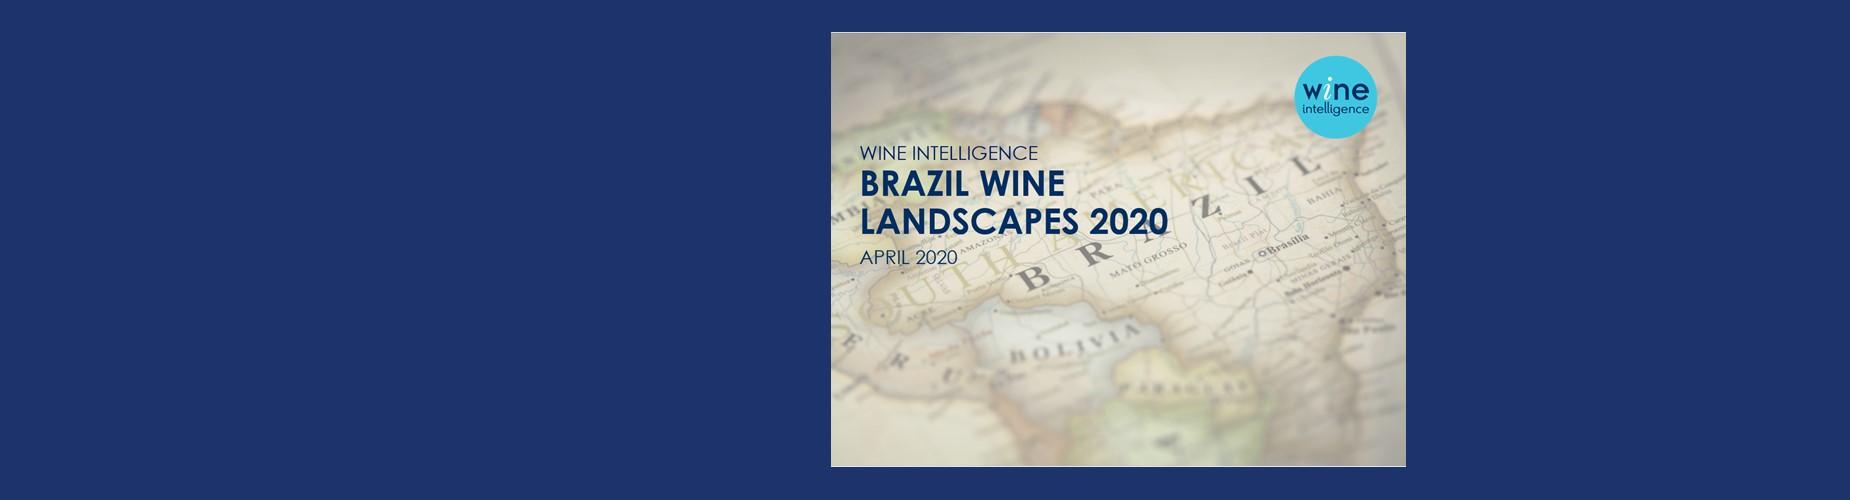 Brazil Landsacpes 2020